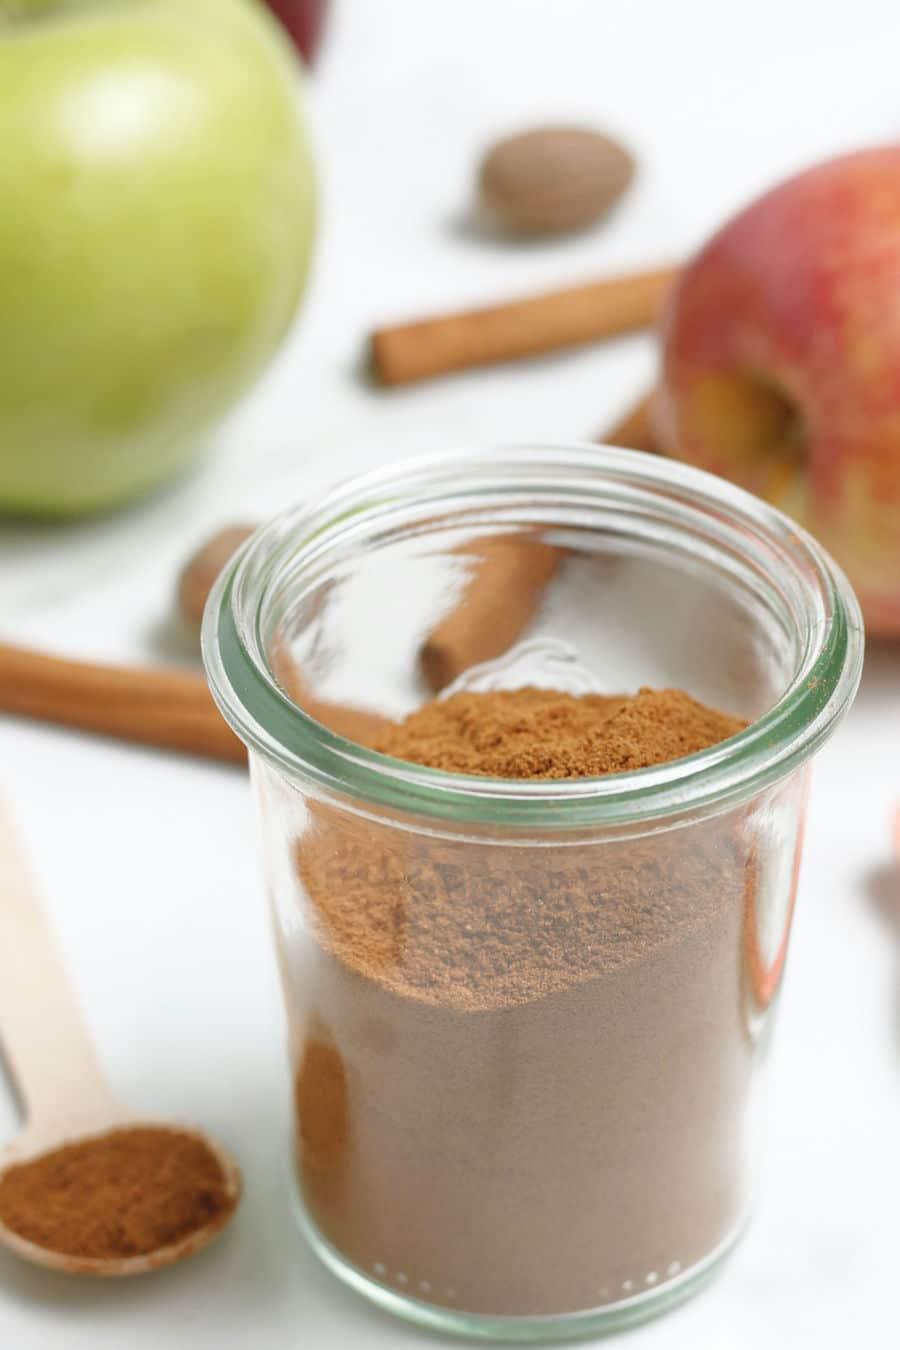 Apple Pie Spice Jar